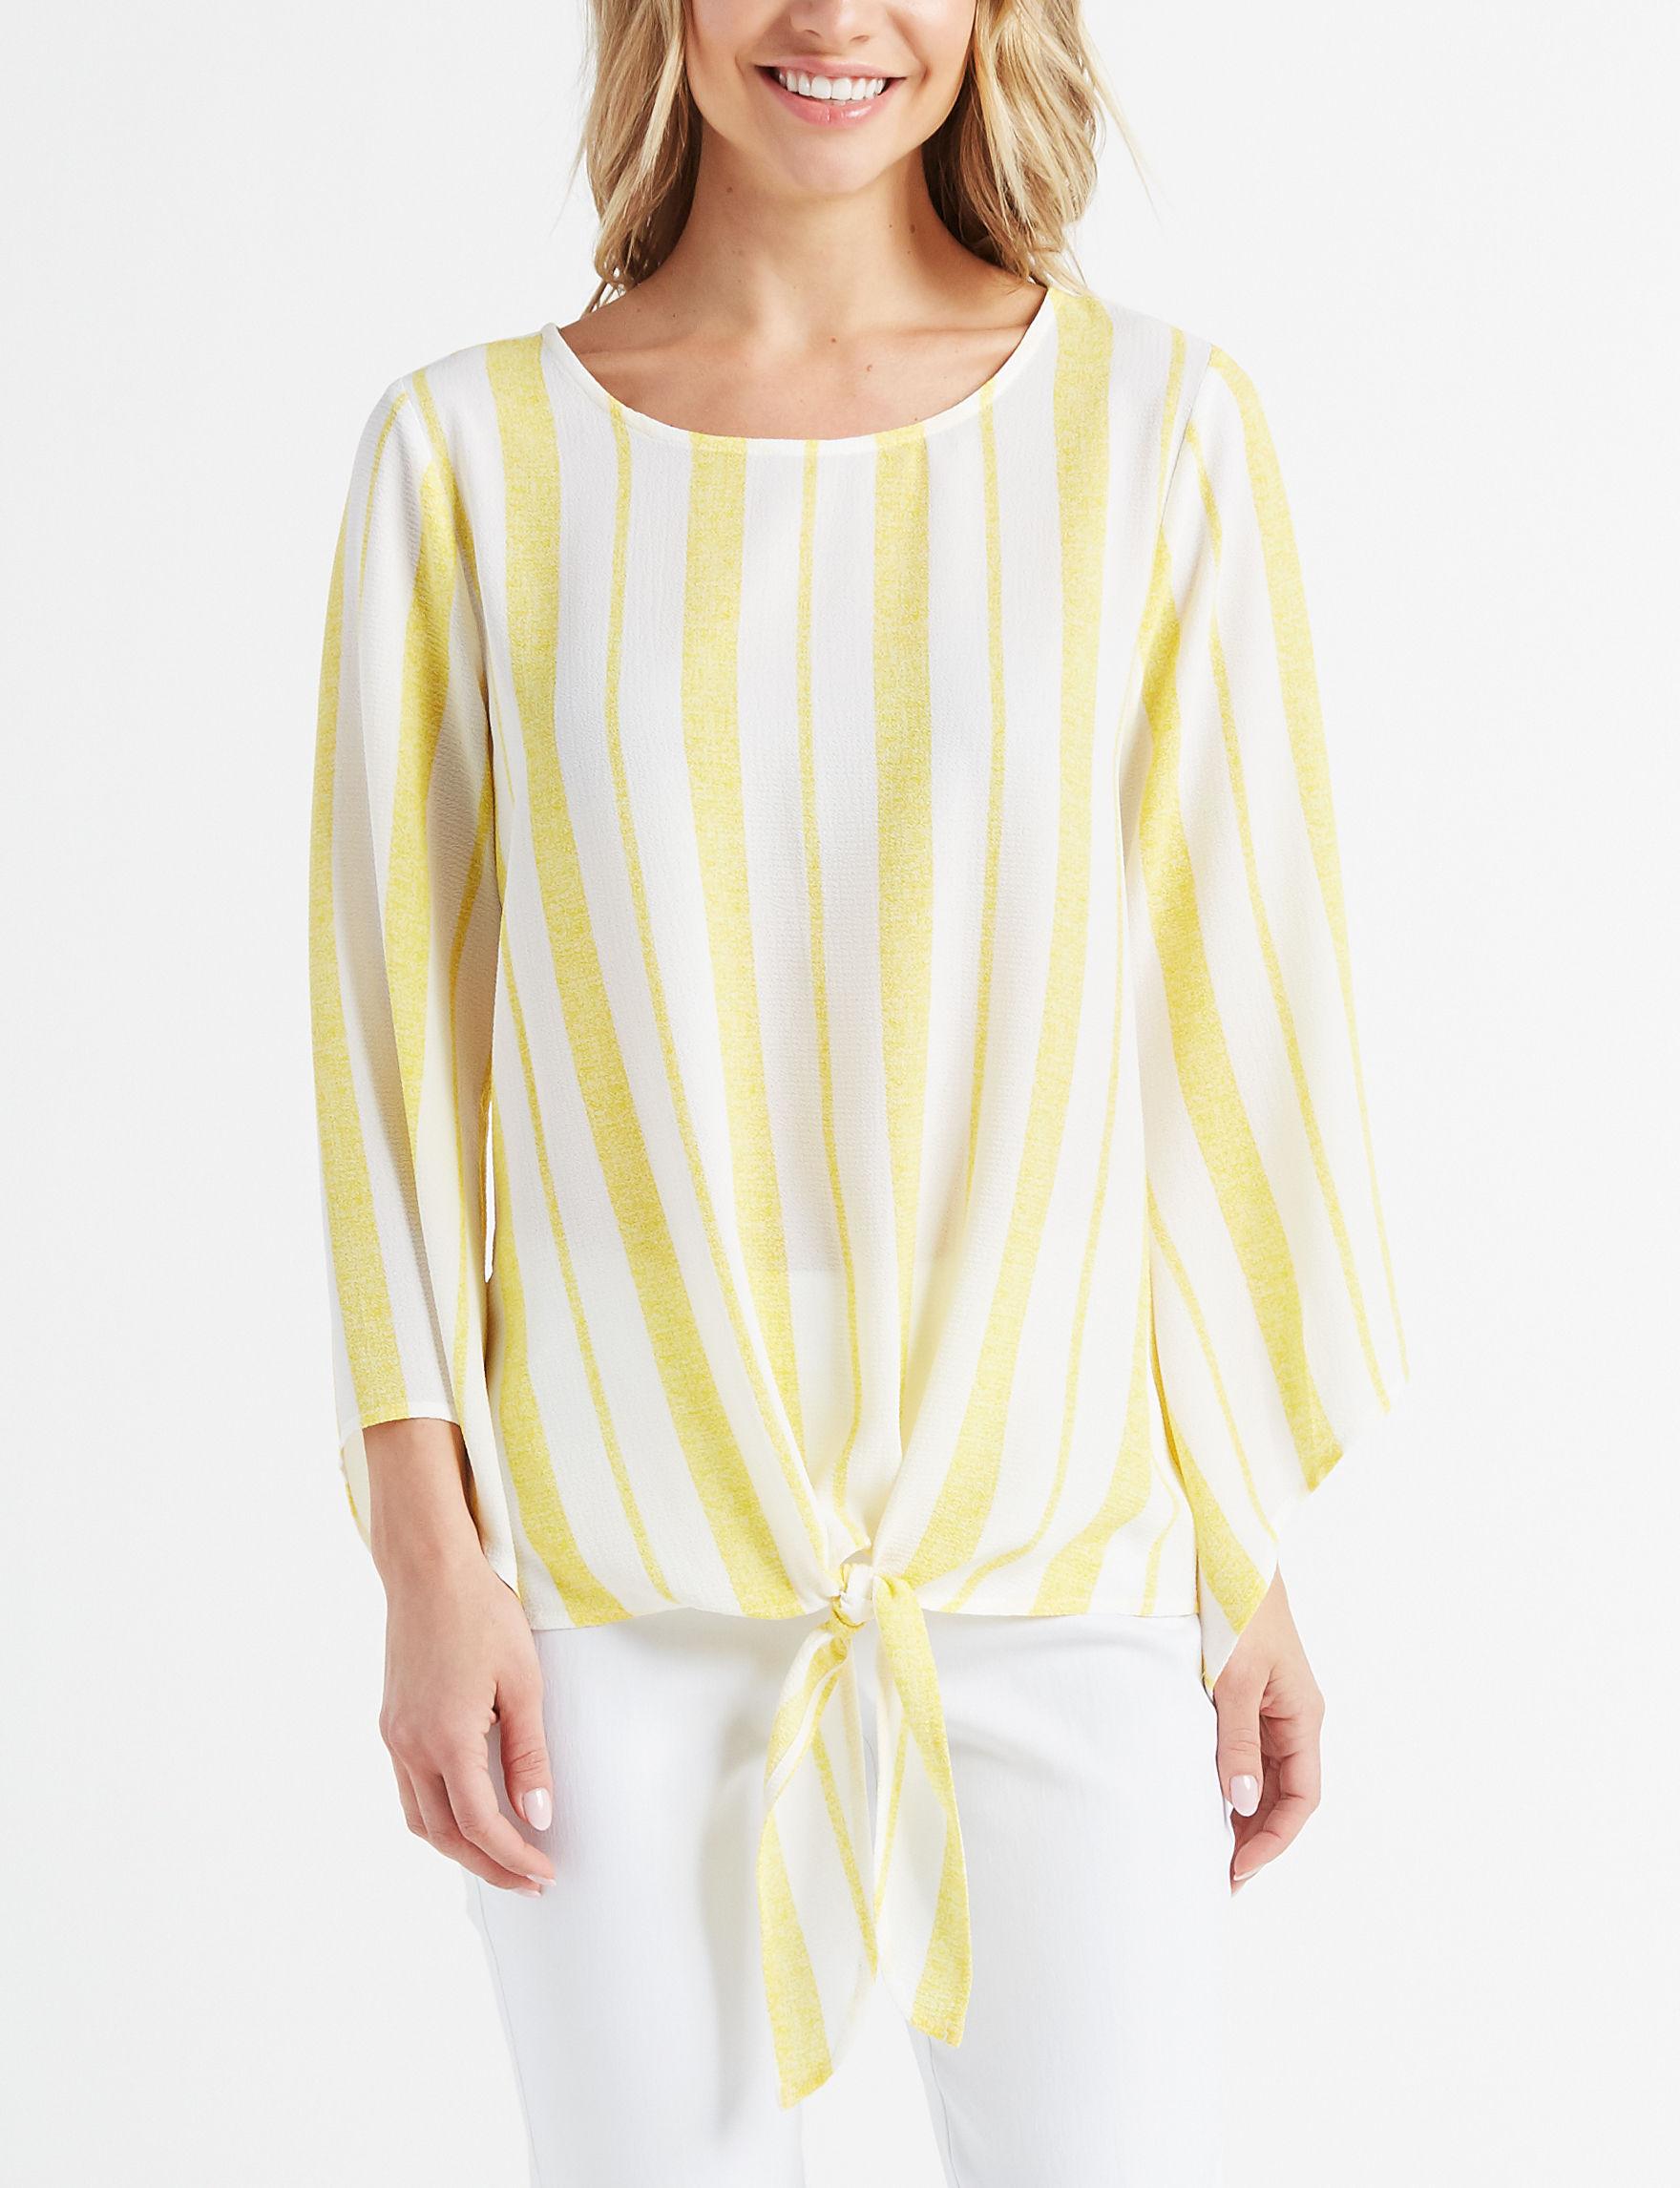 Cocomo Yellow Shirts & Blouses